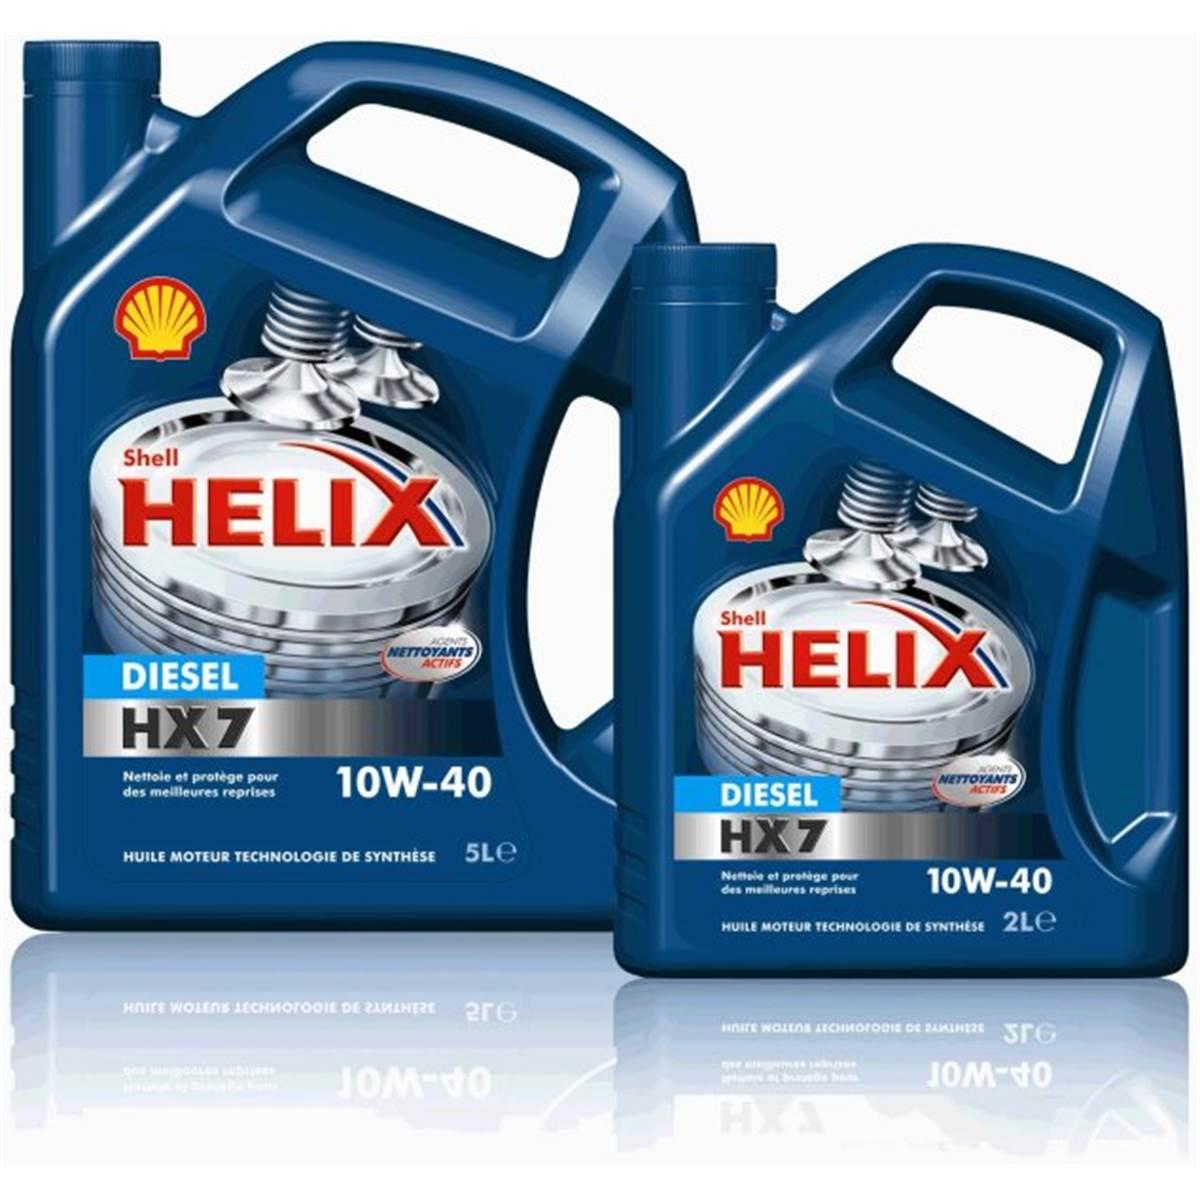 Huile SHELL HELIX710W40 essence 5L+2L